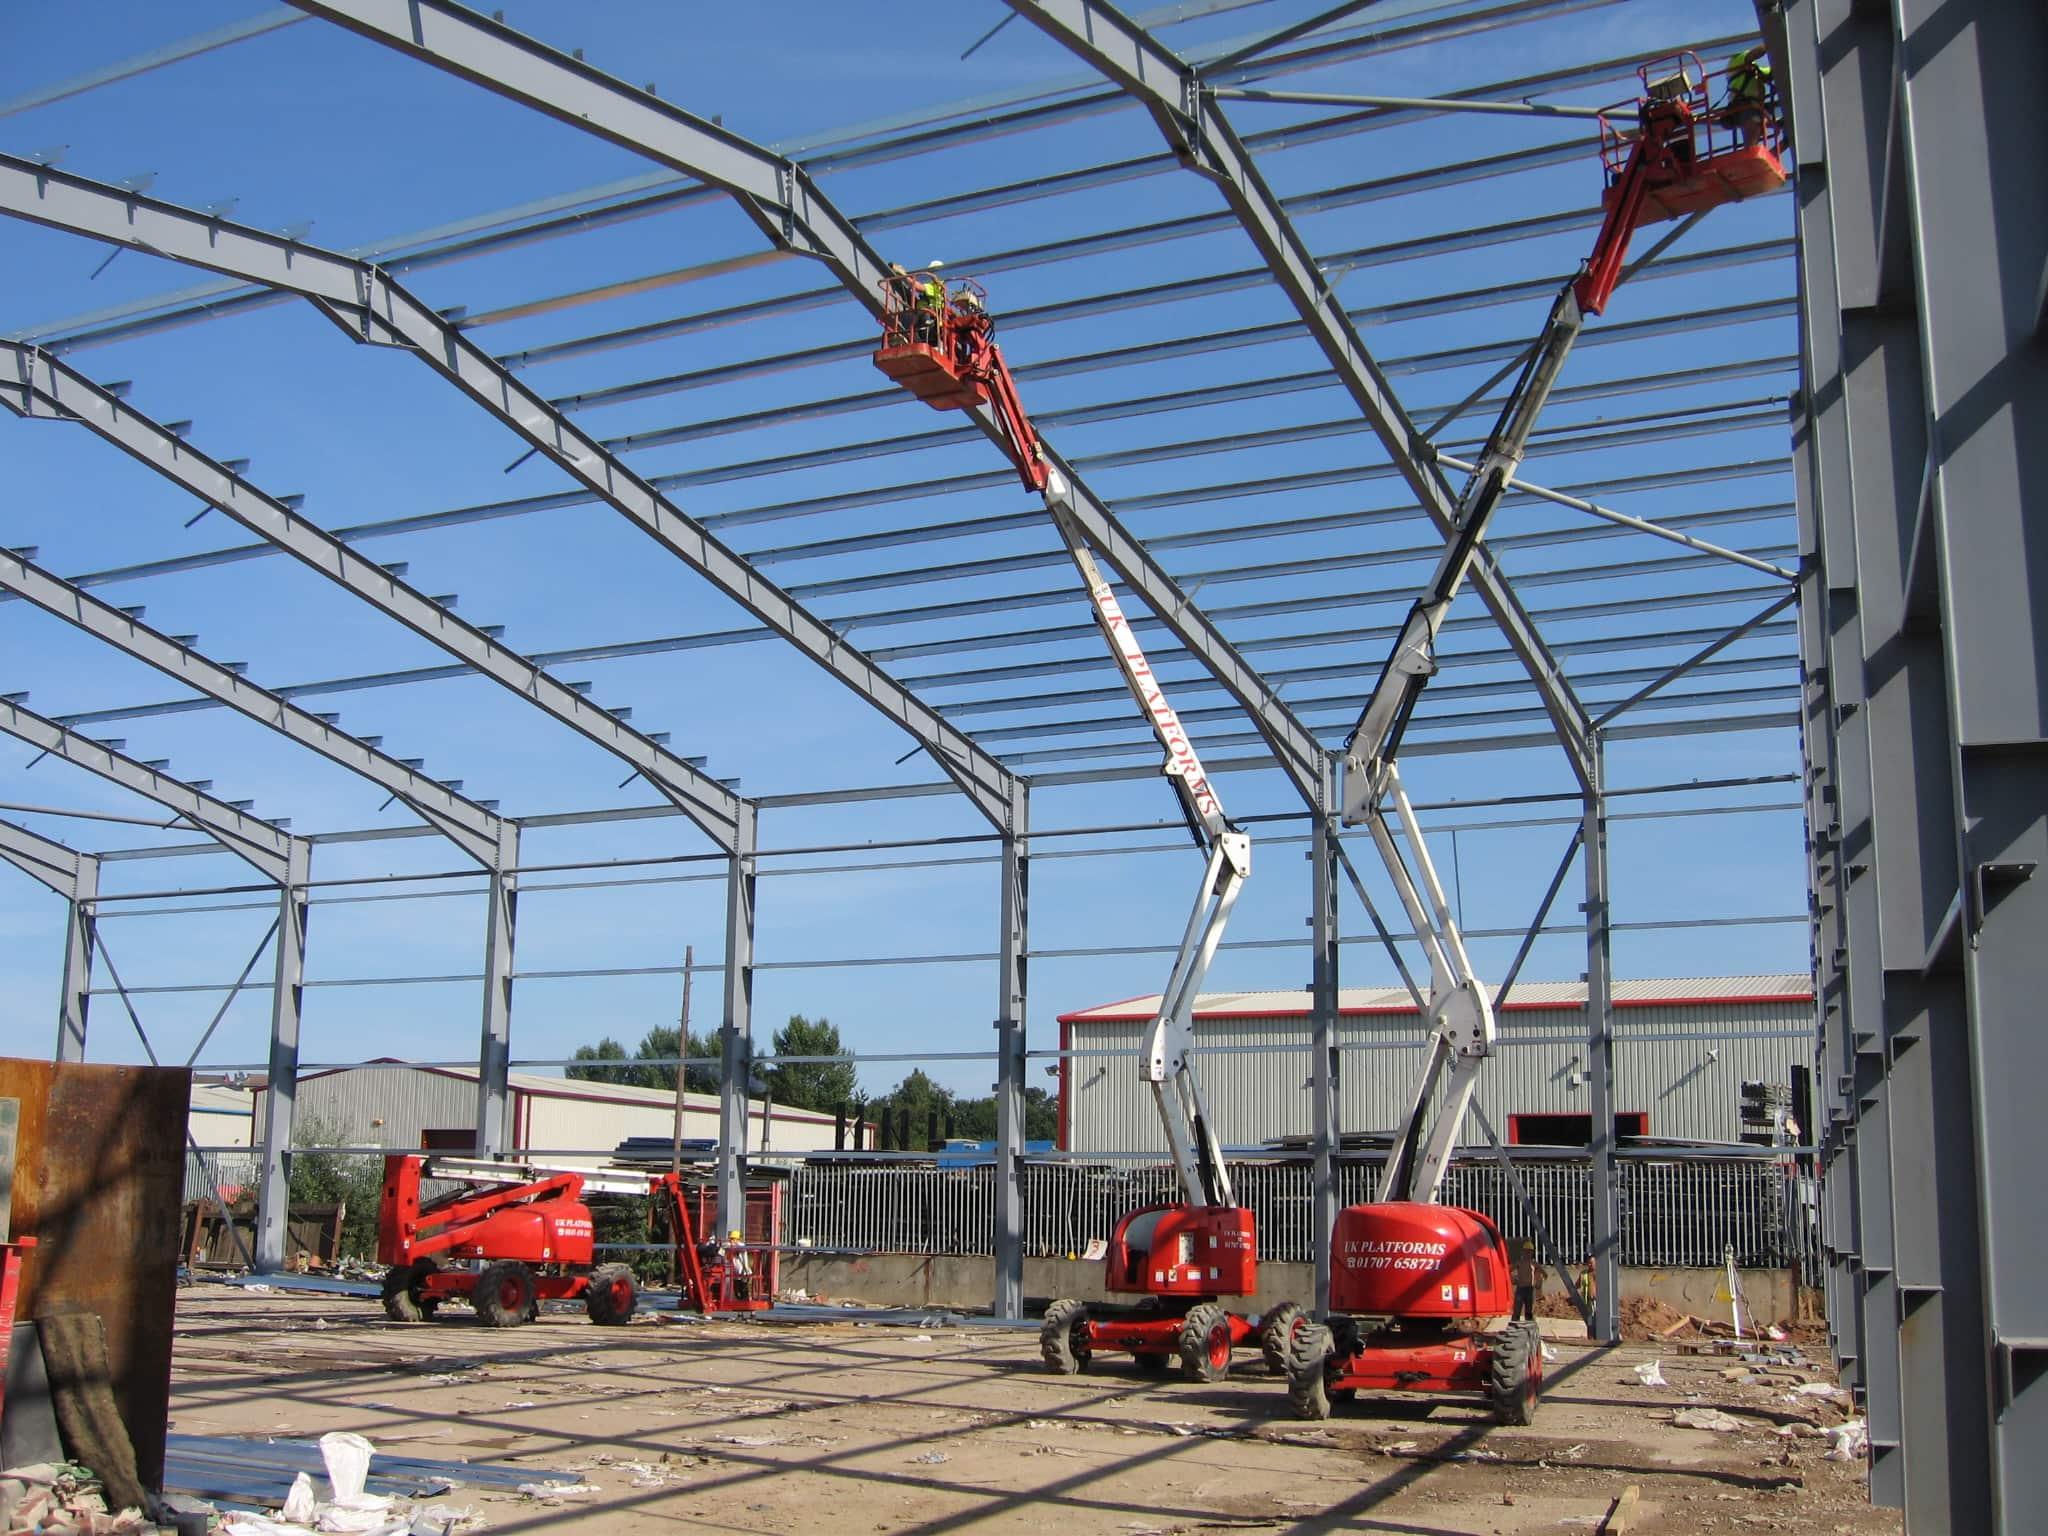 Steel building frame being erected